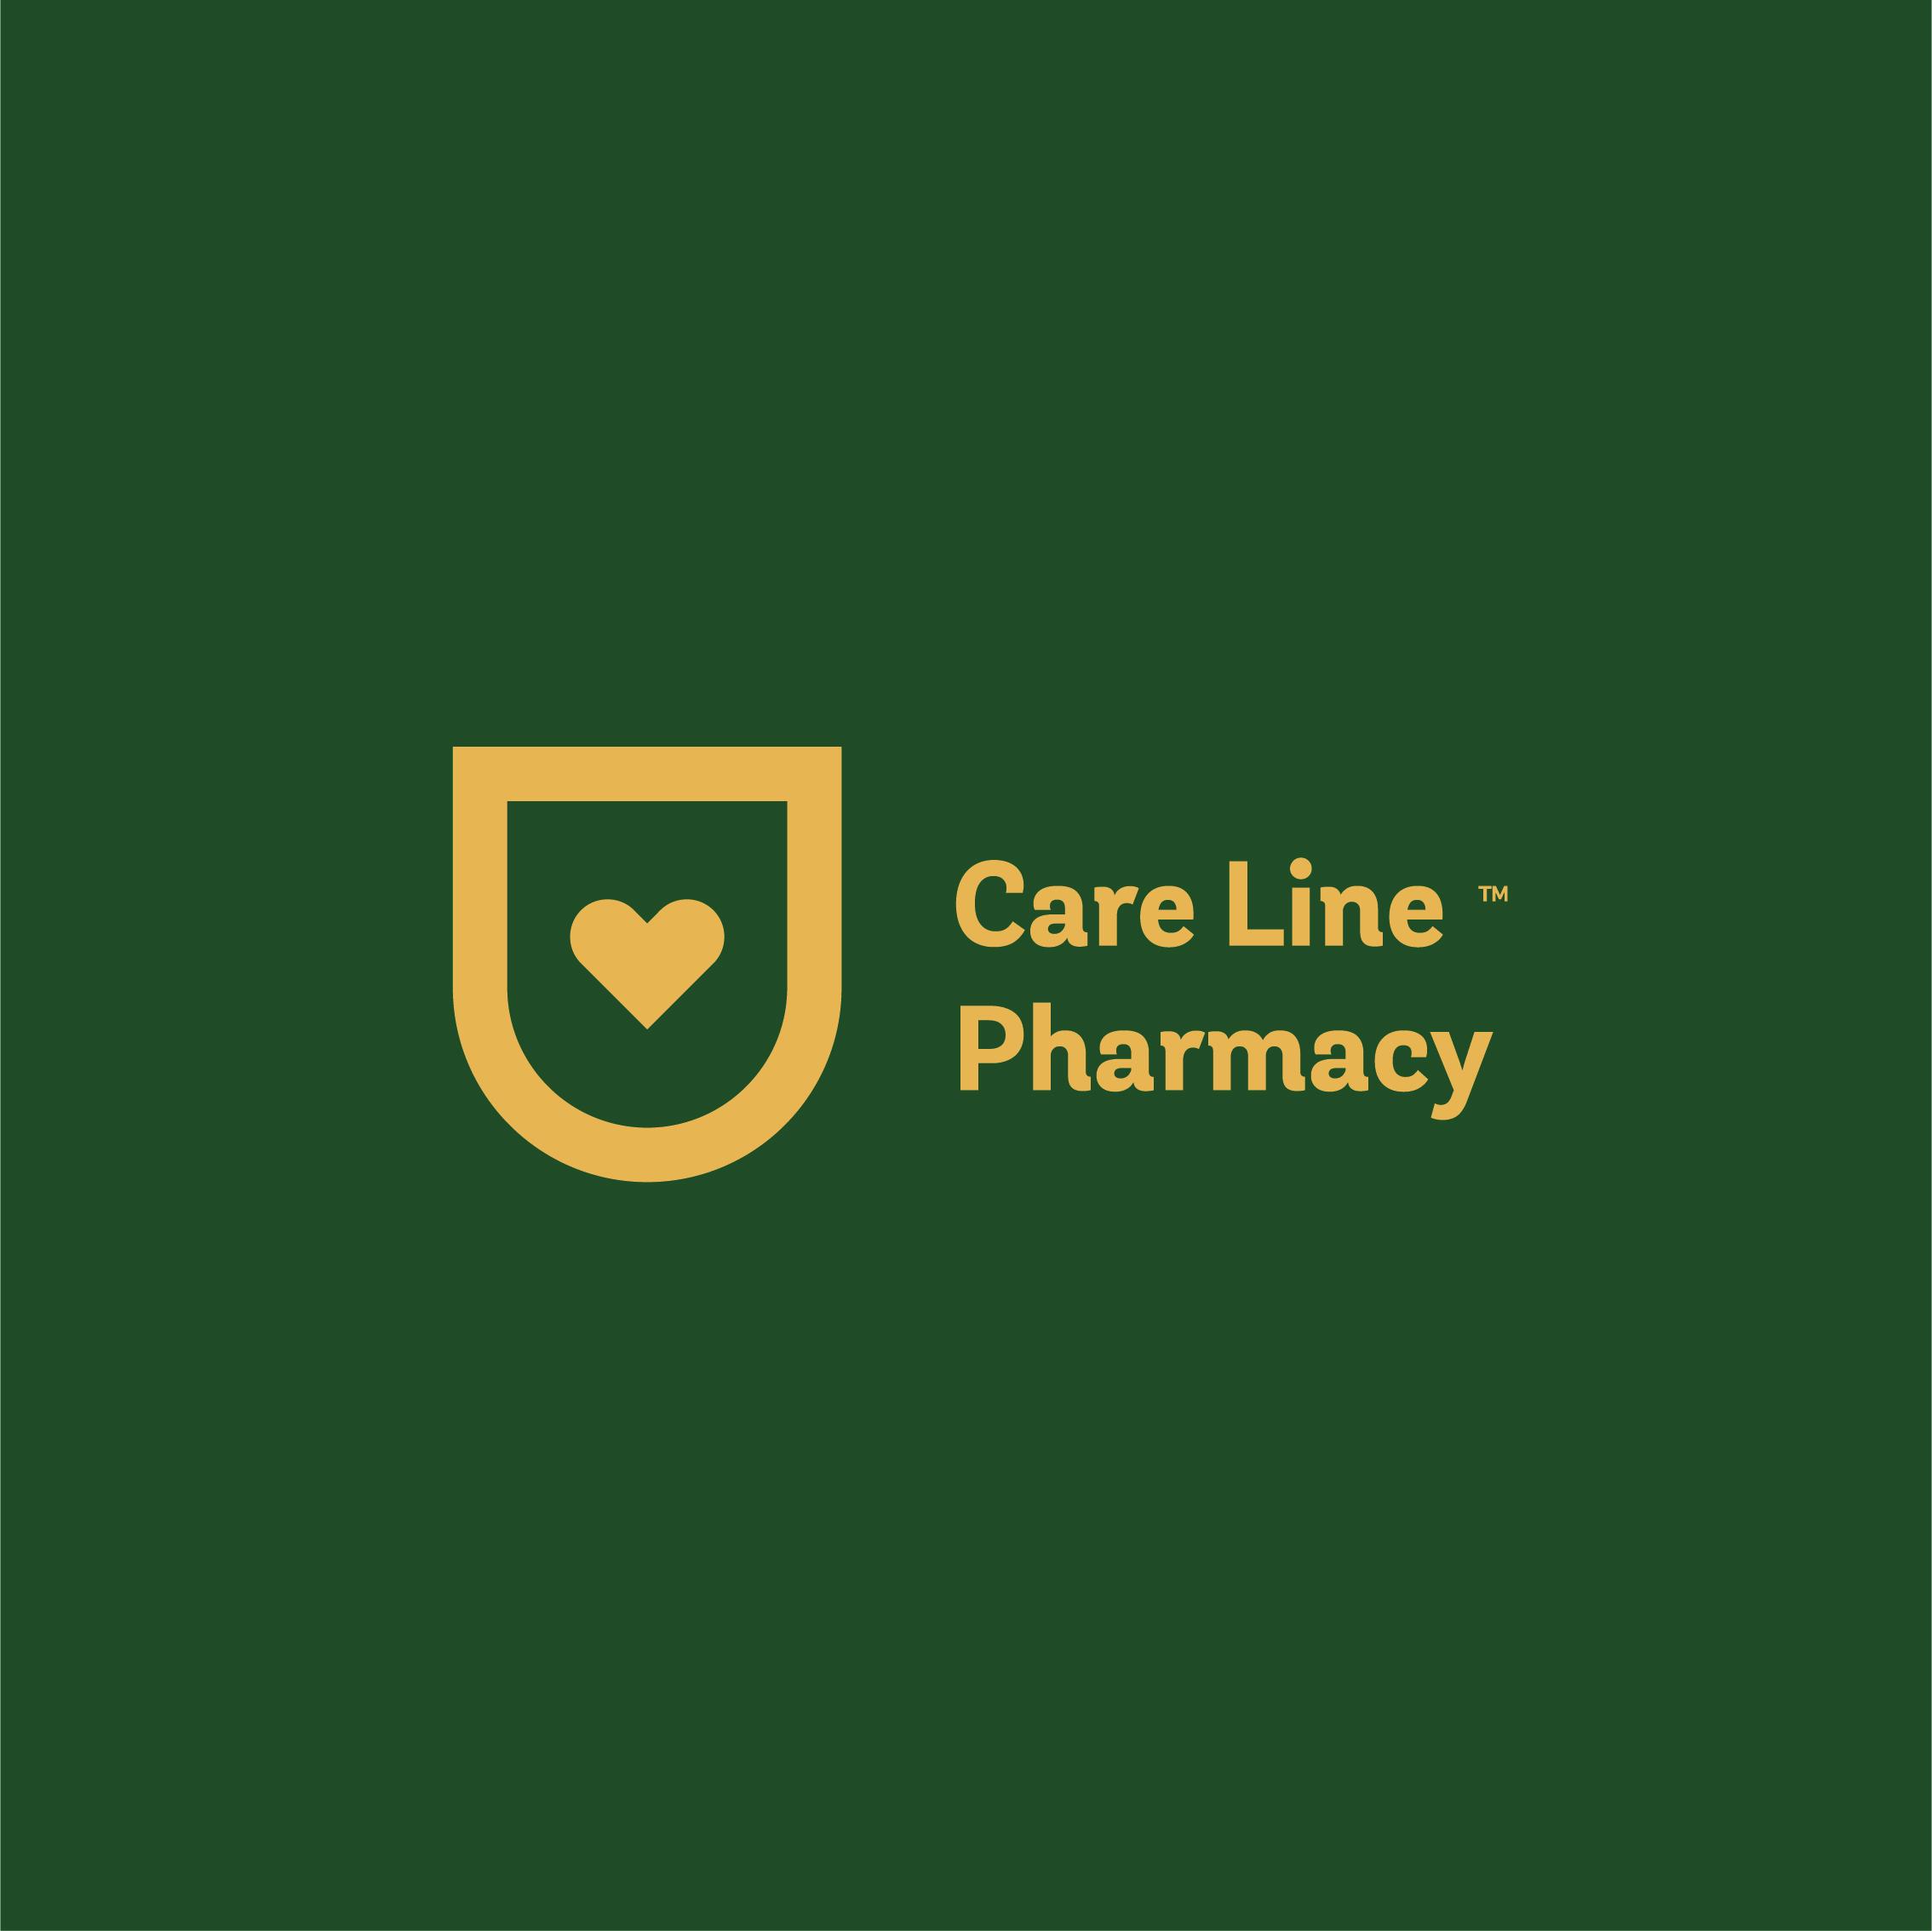 Care line pharmacy logo